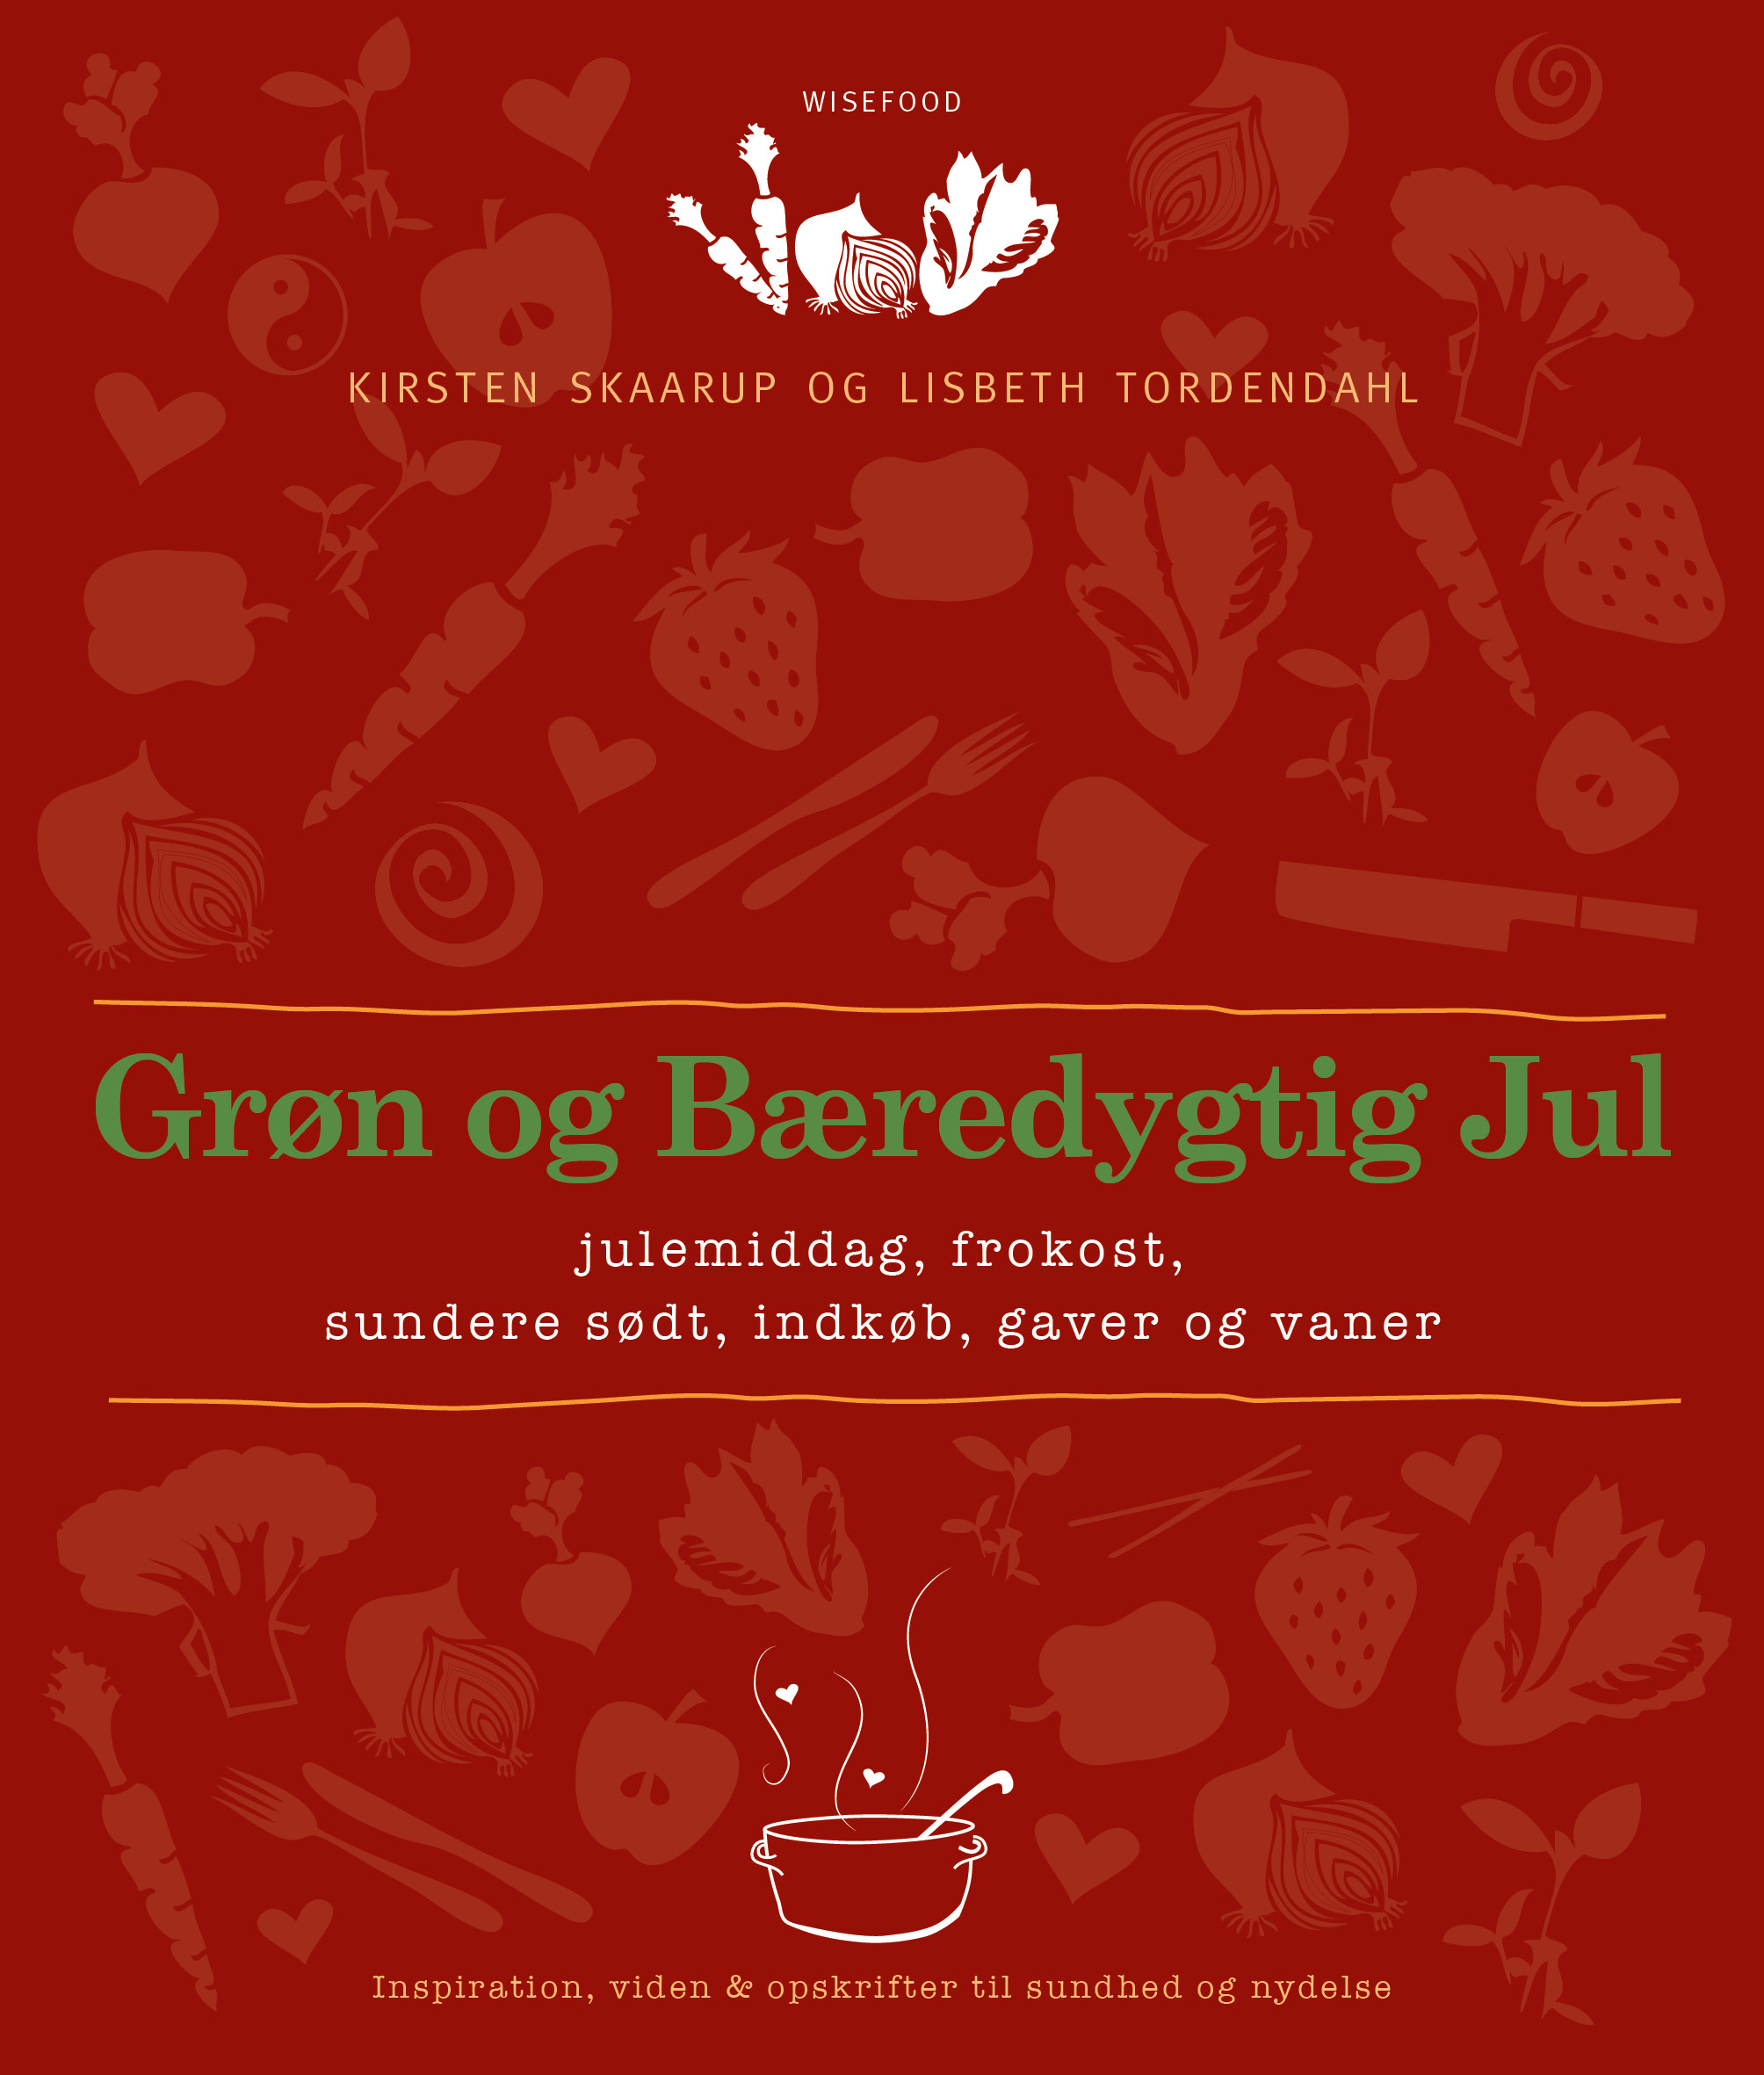 grøn_bæredygtig_jul_wisefood2